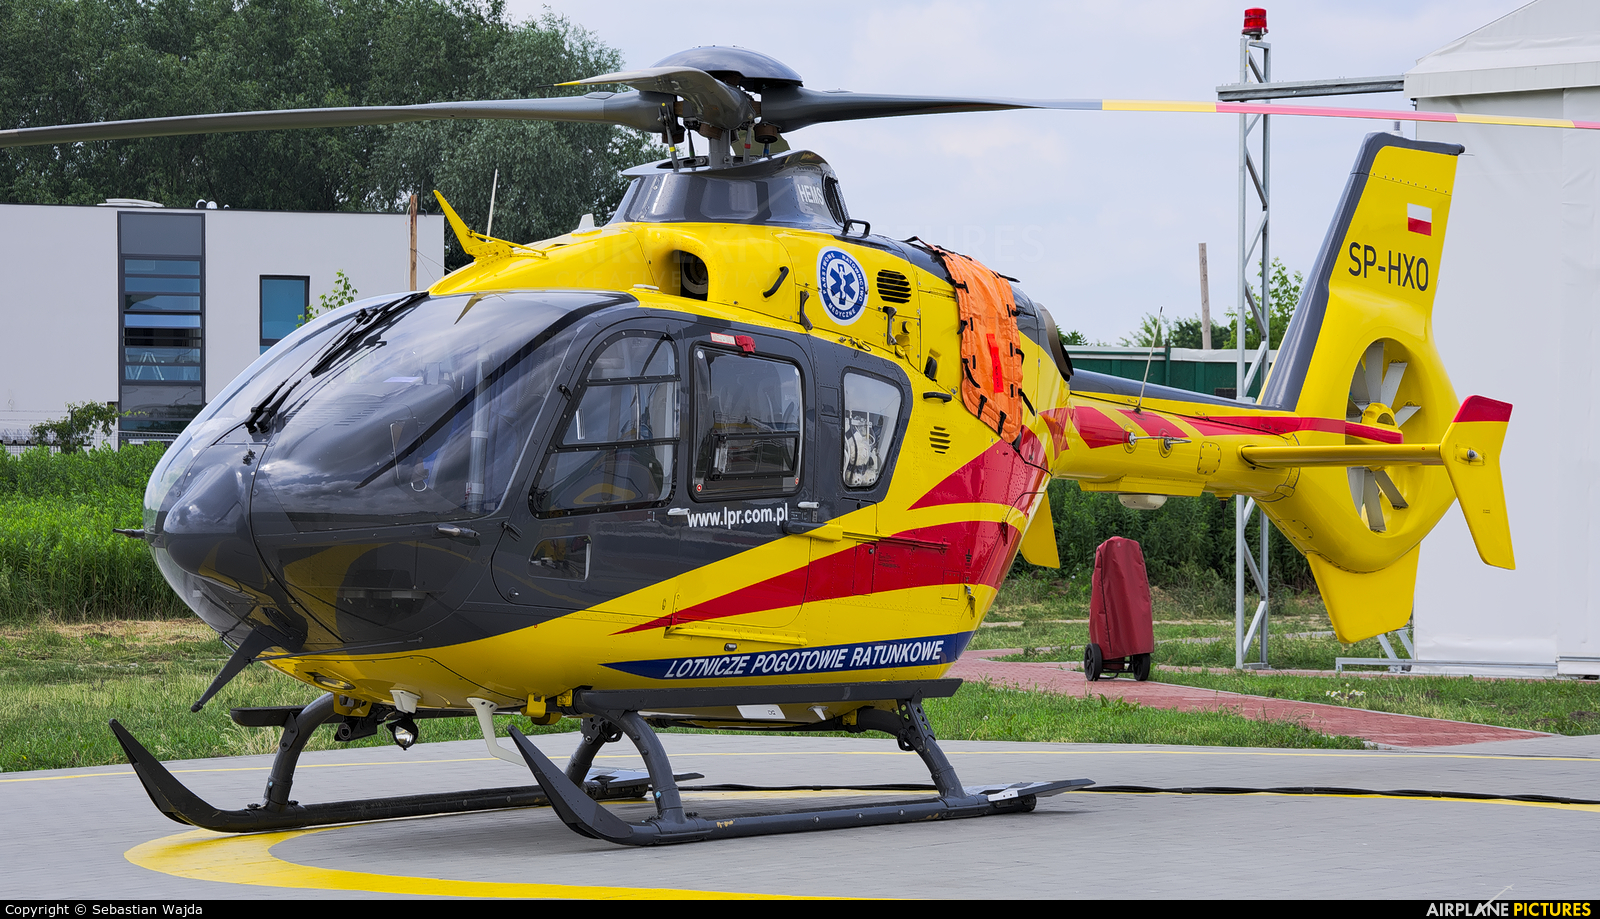 Polish Medical Air Rescue - Lotnicze Pogotowie Ratunkowe SP-HXO aircraft at Płock